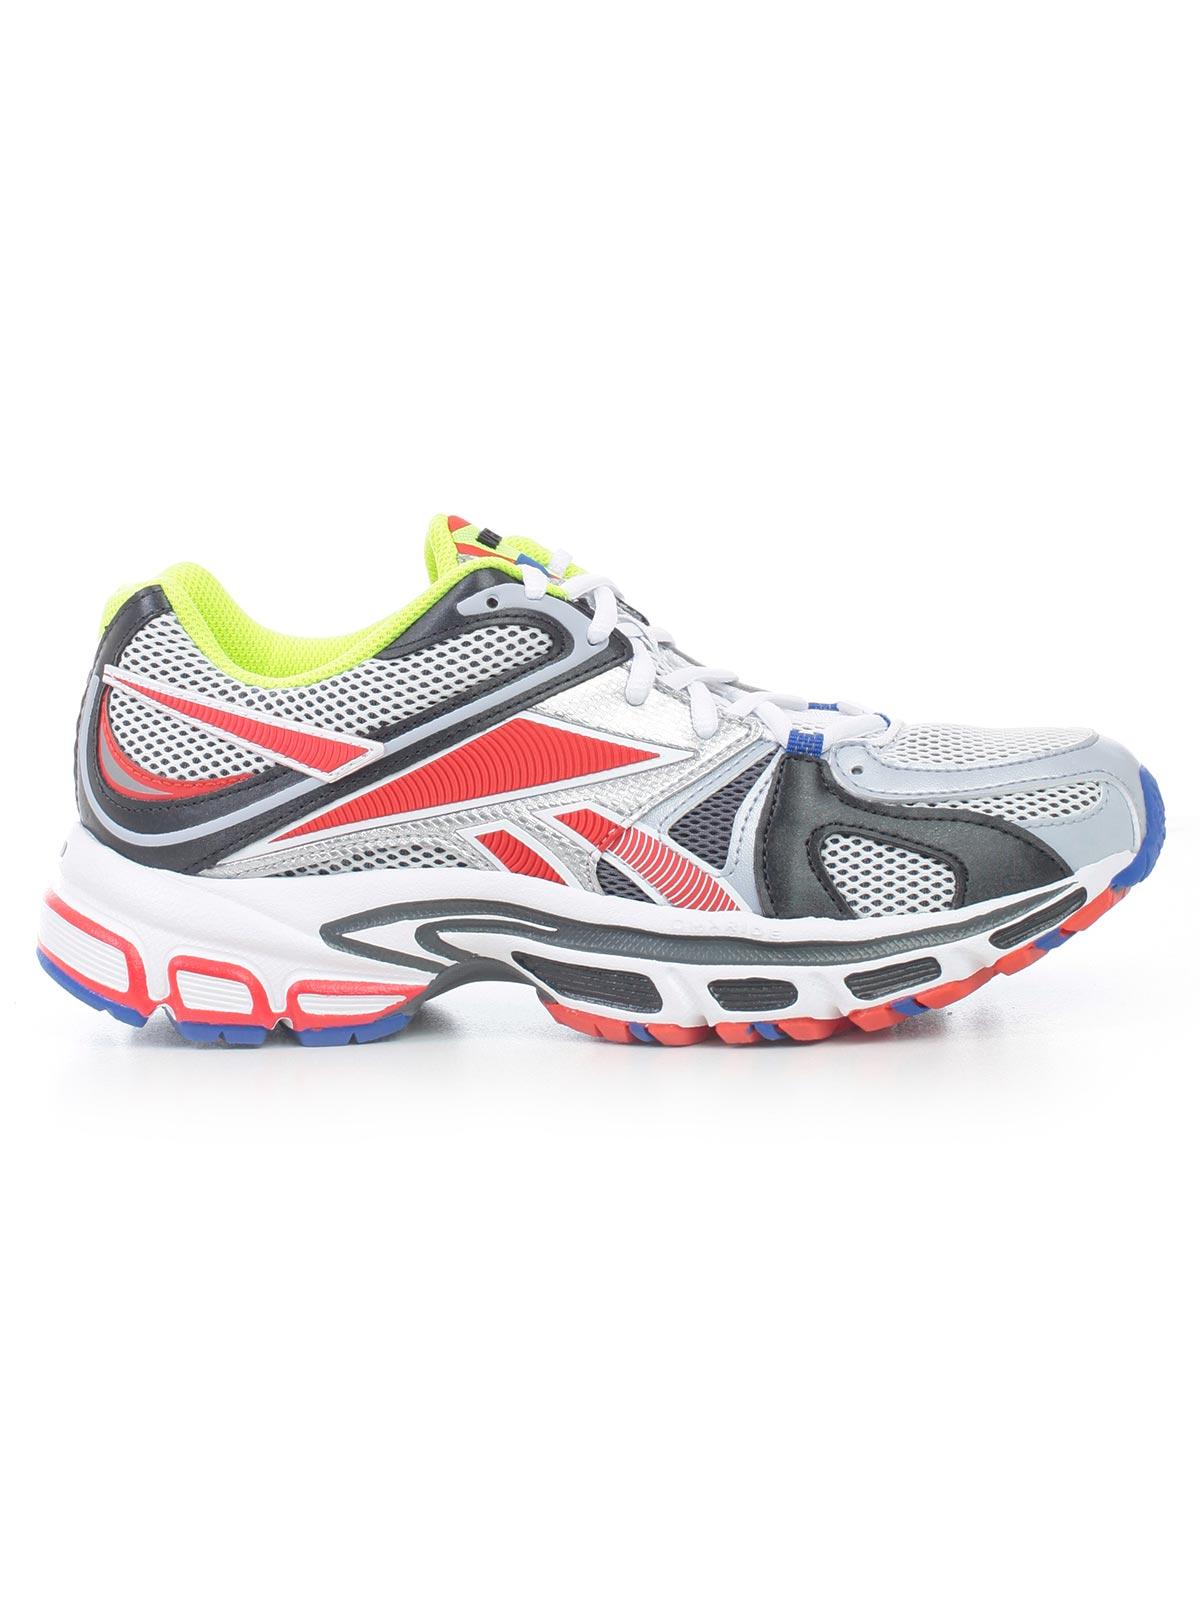 f079daf9119ef2 Vetements Shoes USS19RE2 - FLUO YELLOW.Bernardelli Store - Online ...